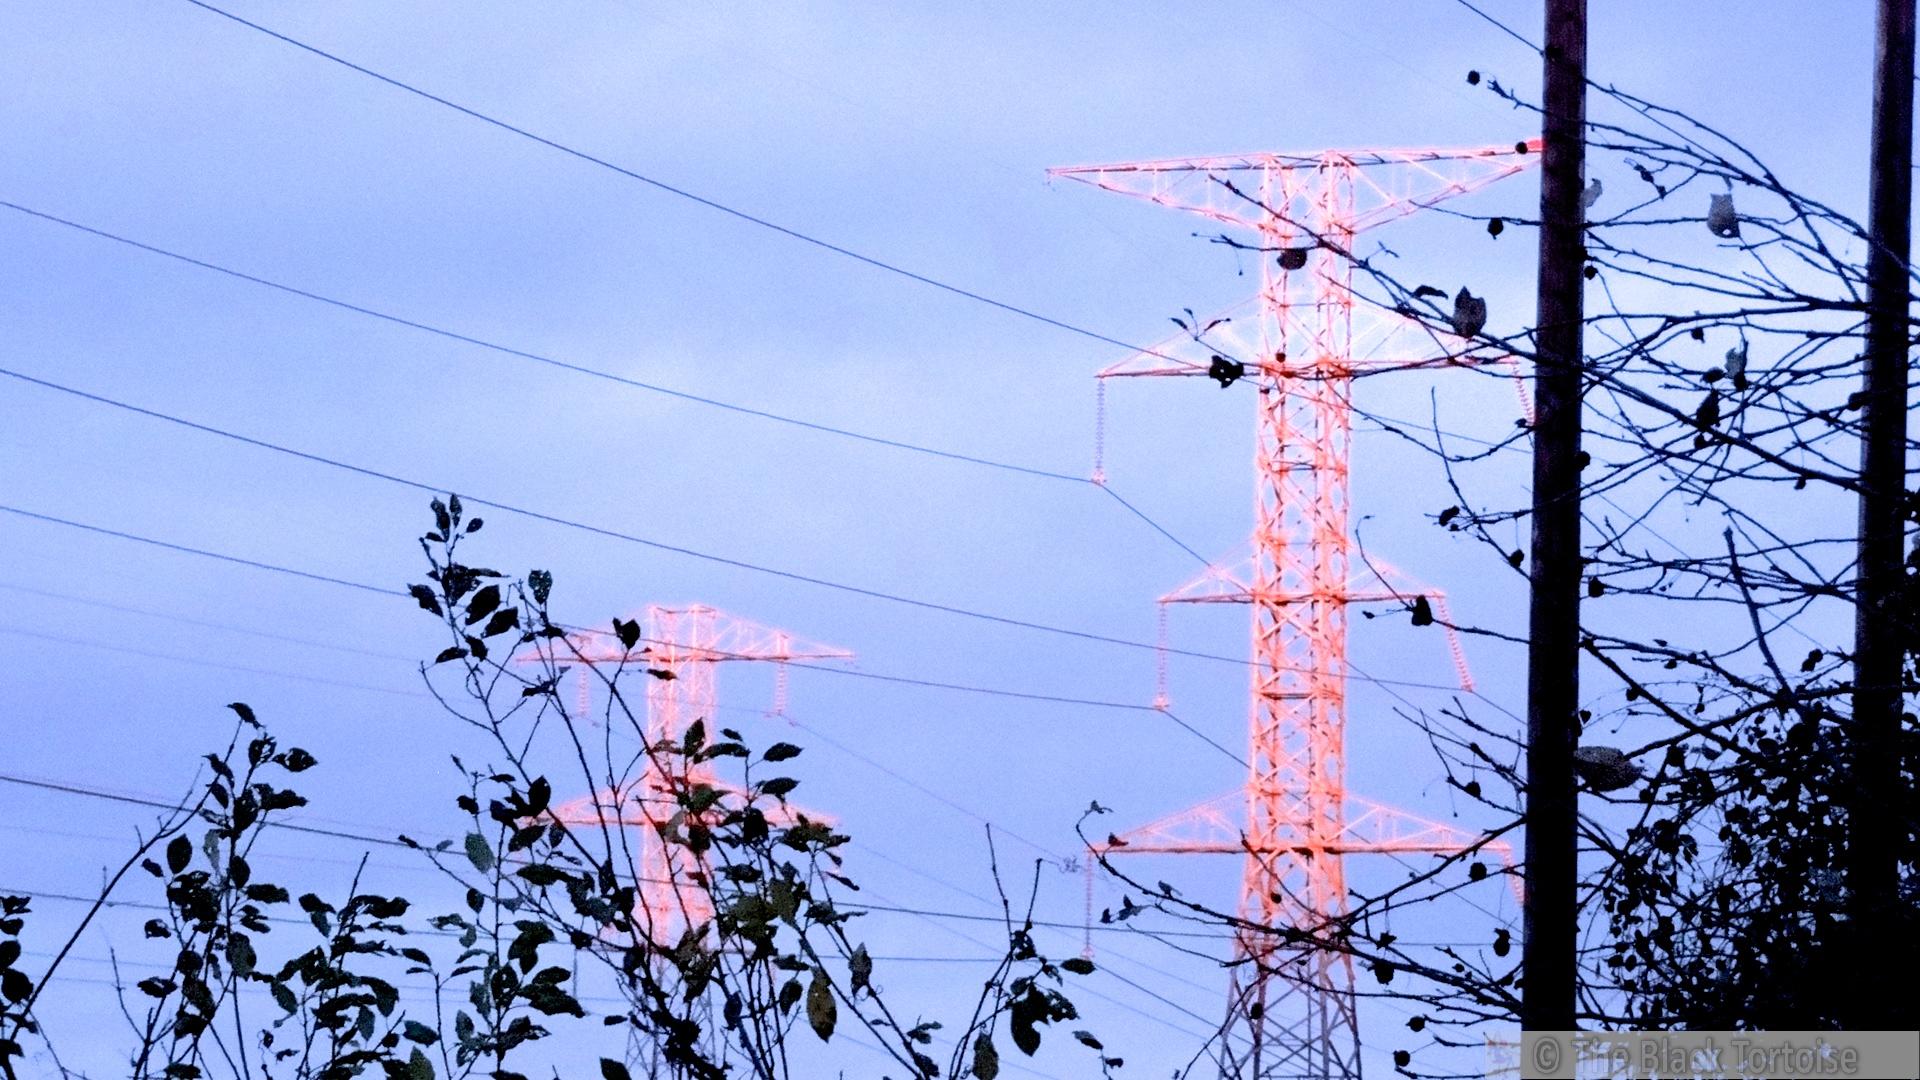 sunlight on wire2